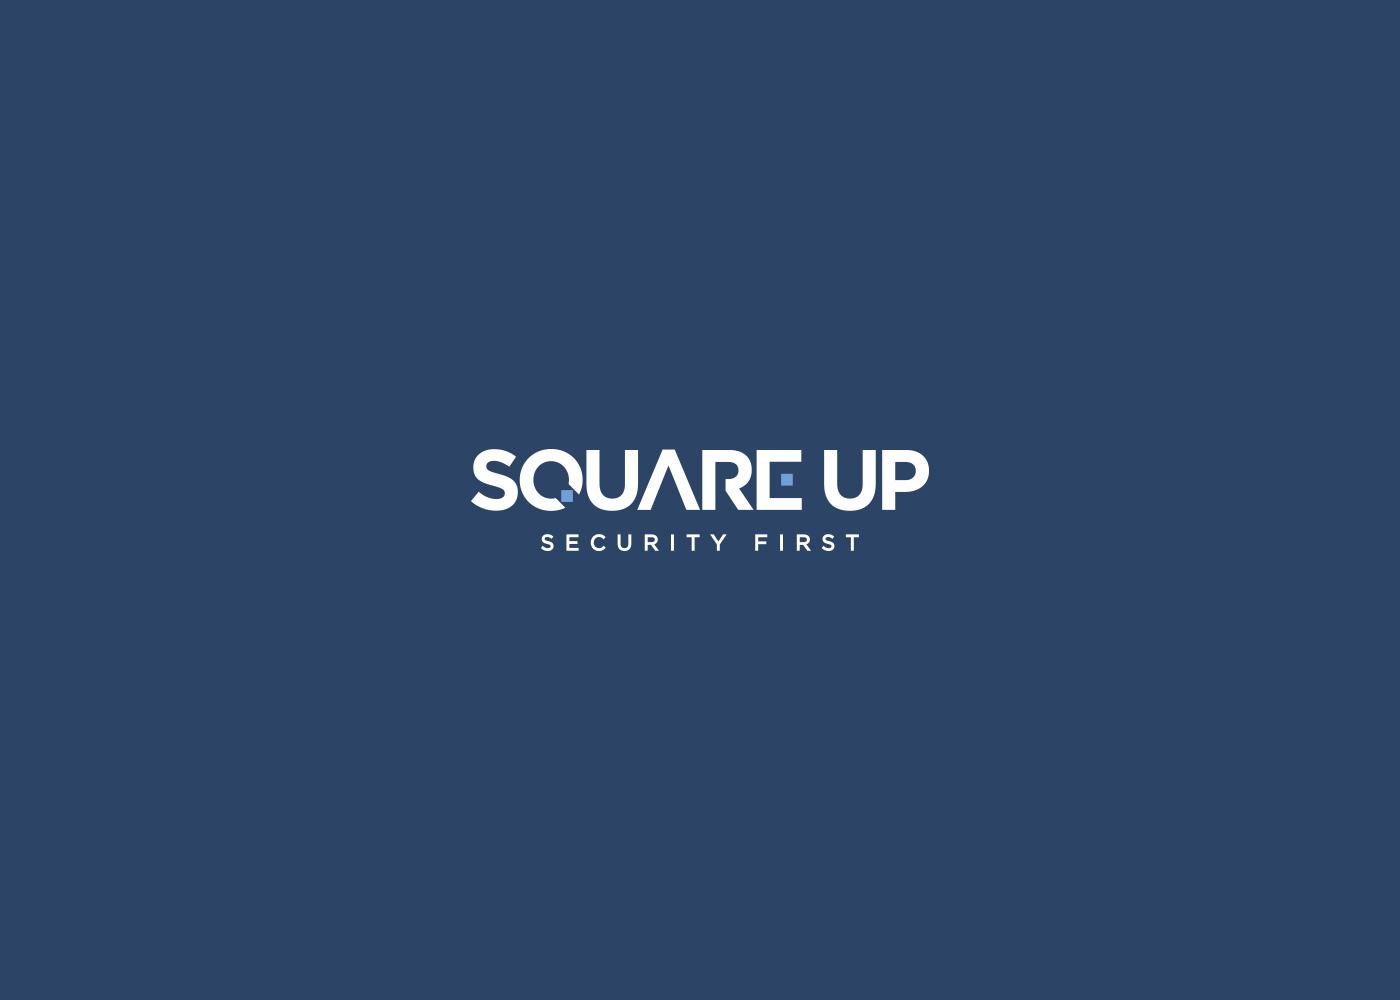 grafioc milano squareup logo 02